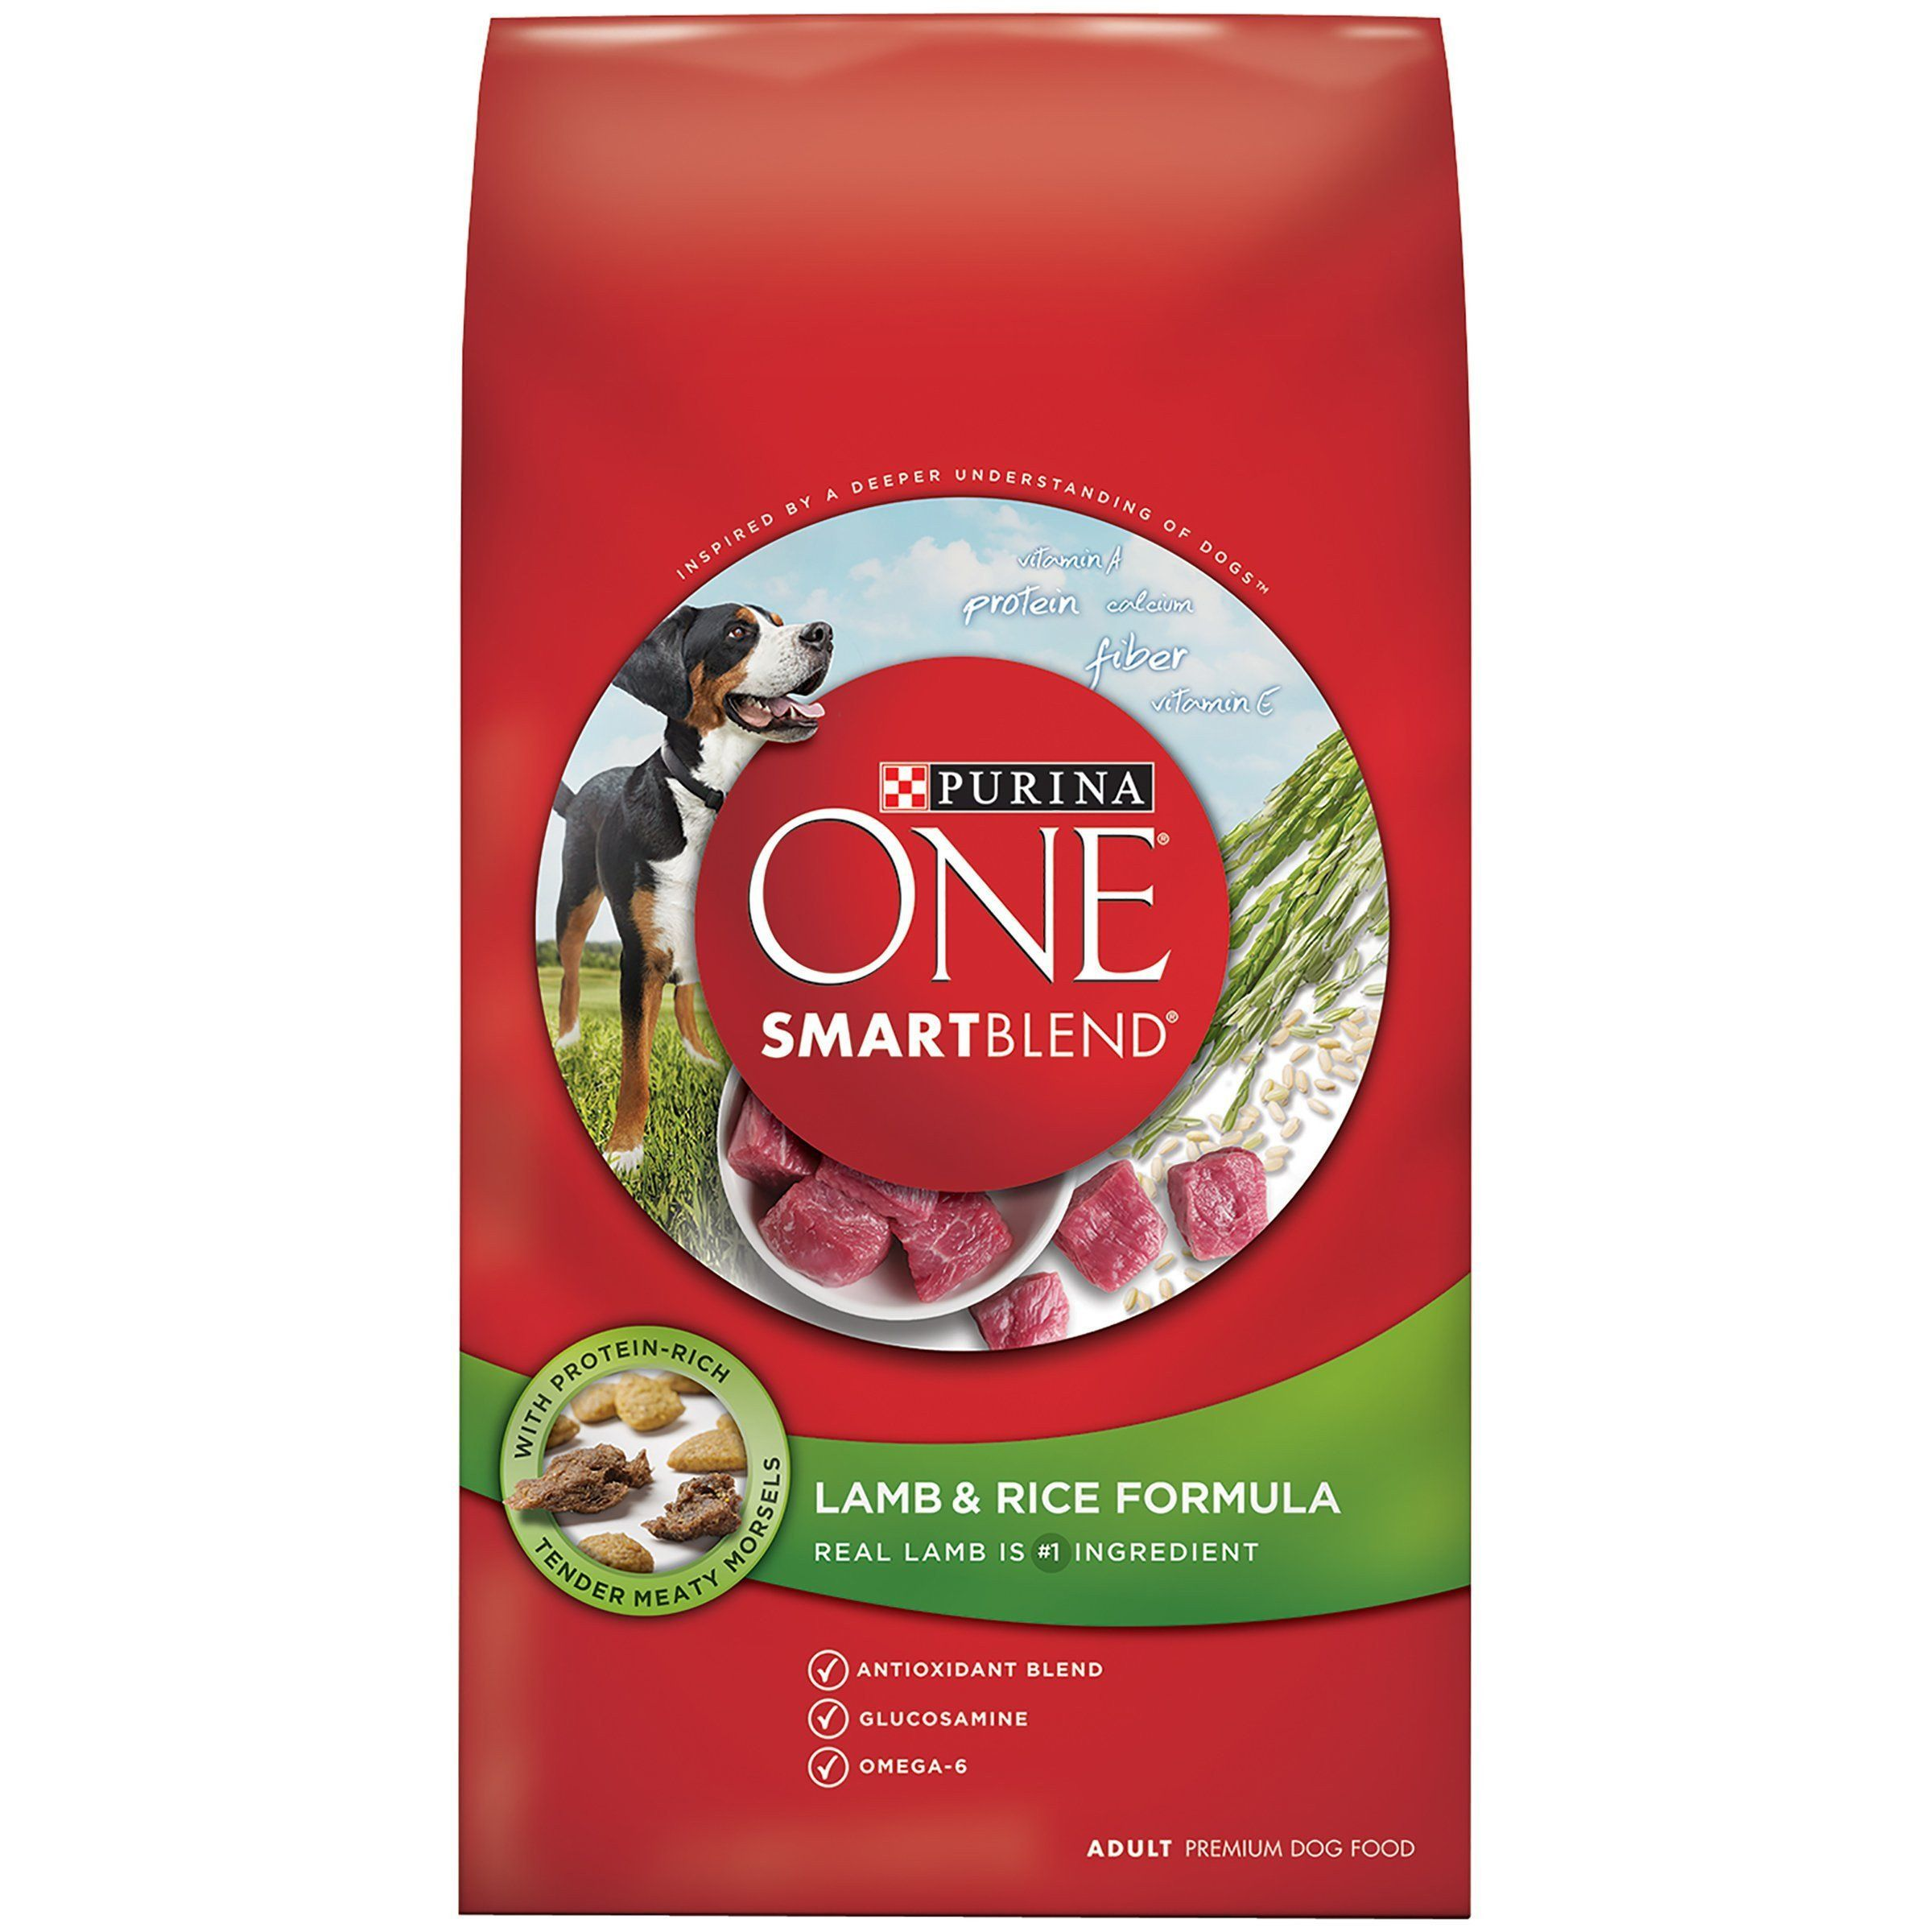 Purina ONE SmartBlend Lamb & Rice Formula Dry Dog Food Standard Packaging 31.1 lb. Bag